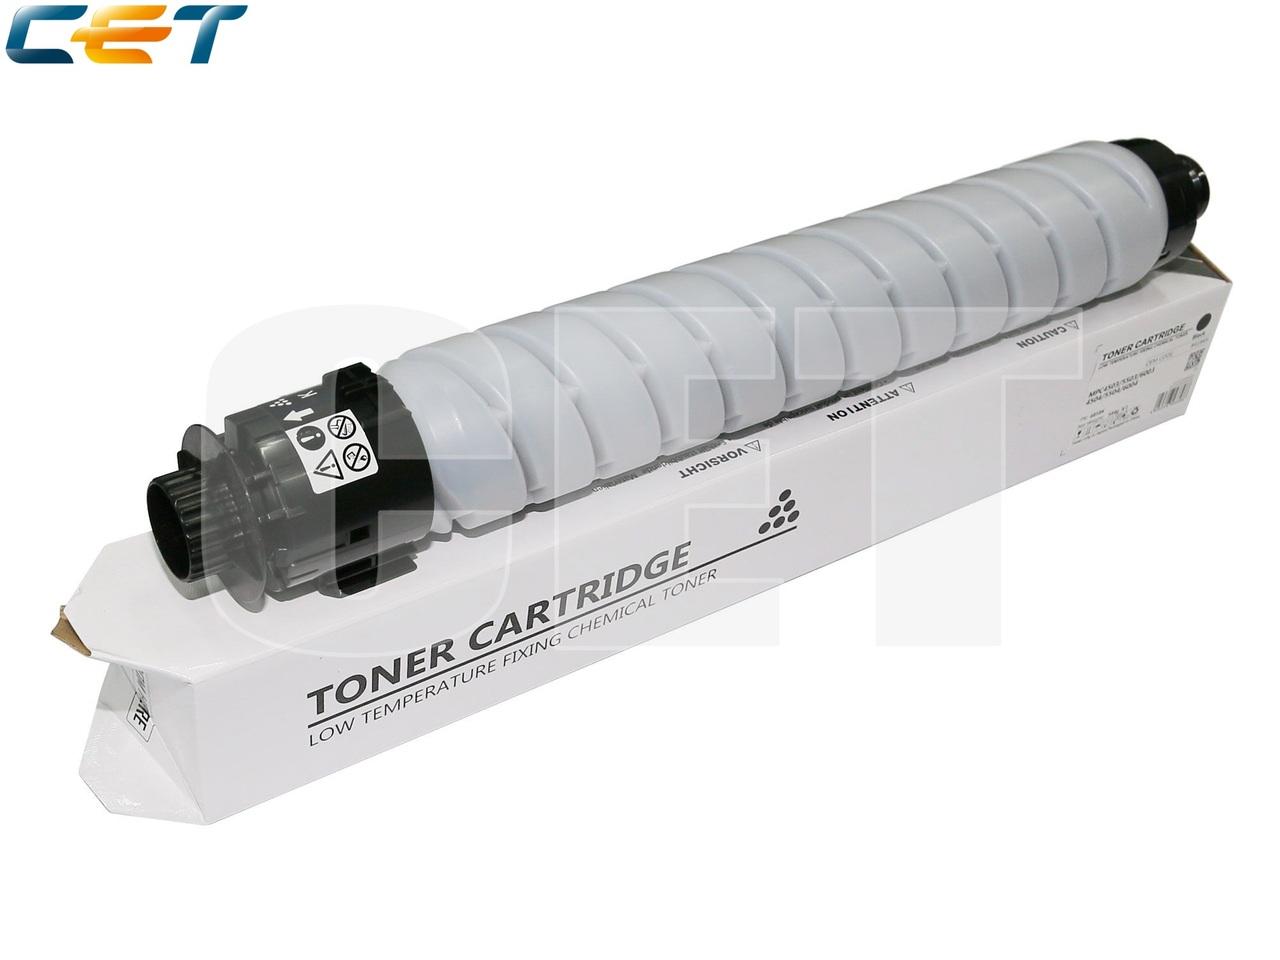 Тонер-картридж (CPP, HT8) 841853 для RICOH AficioMPC4503/5503/6003 (CET) Black, (WW), 544г, 33000 стр.,CET6858K